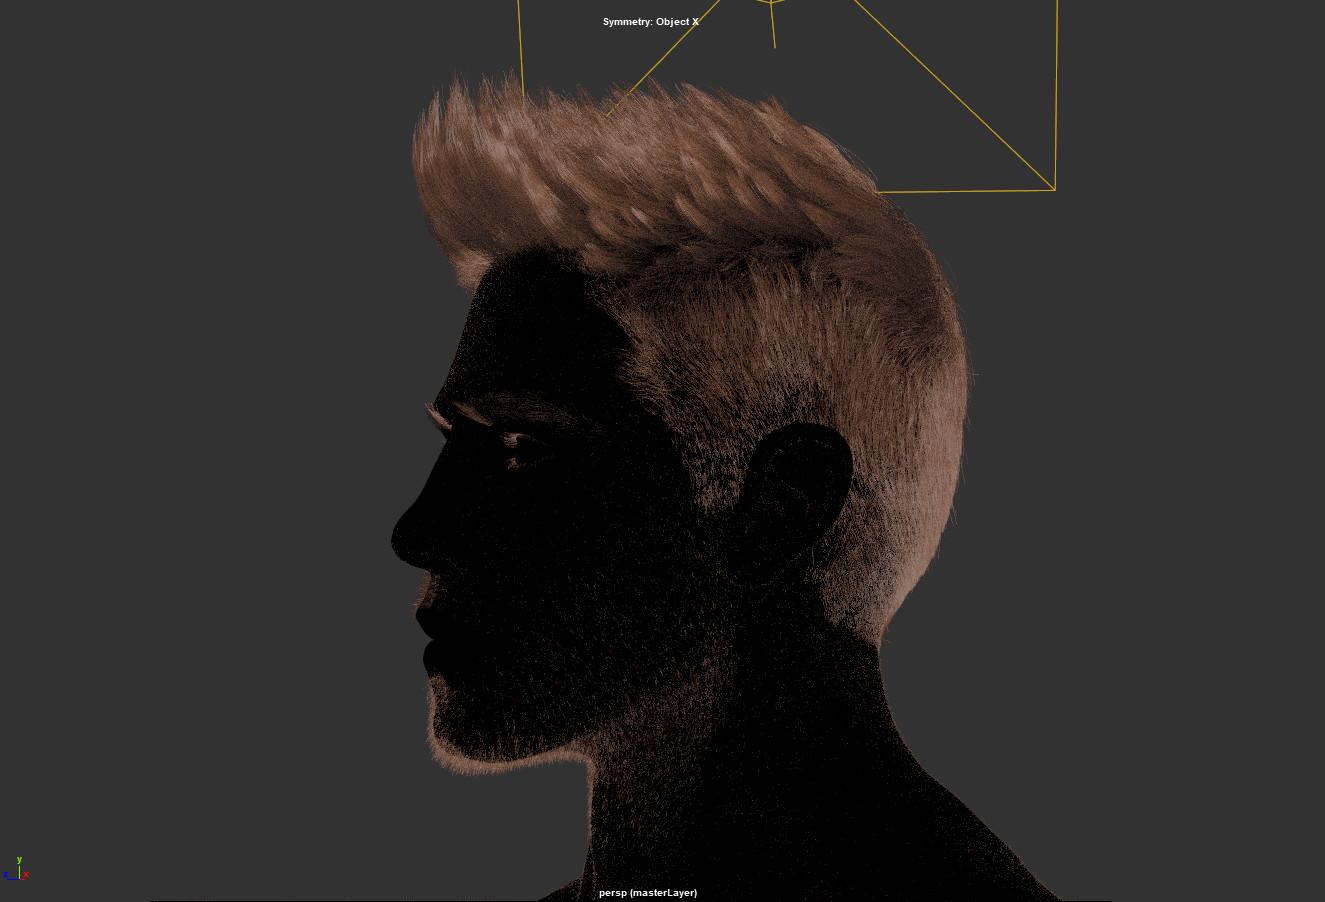 Maya Viewport  Snapshot  showing xgen hair